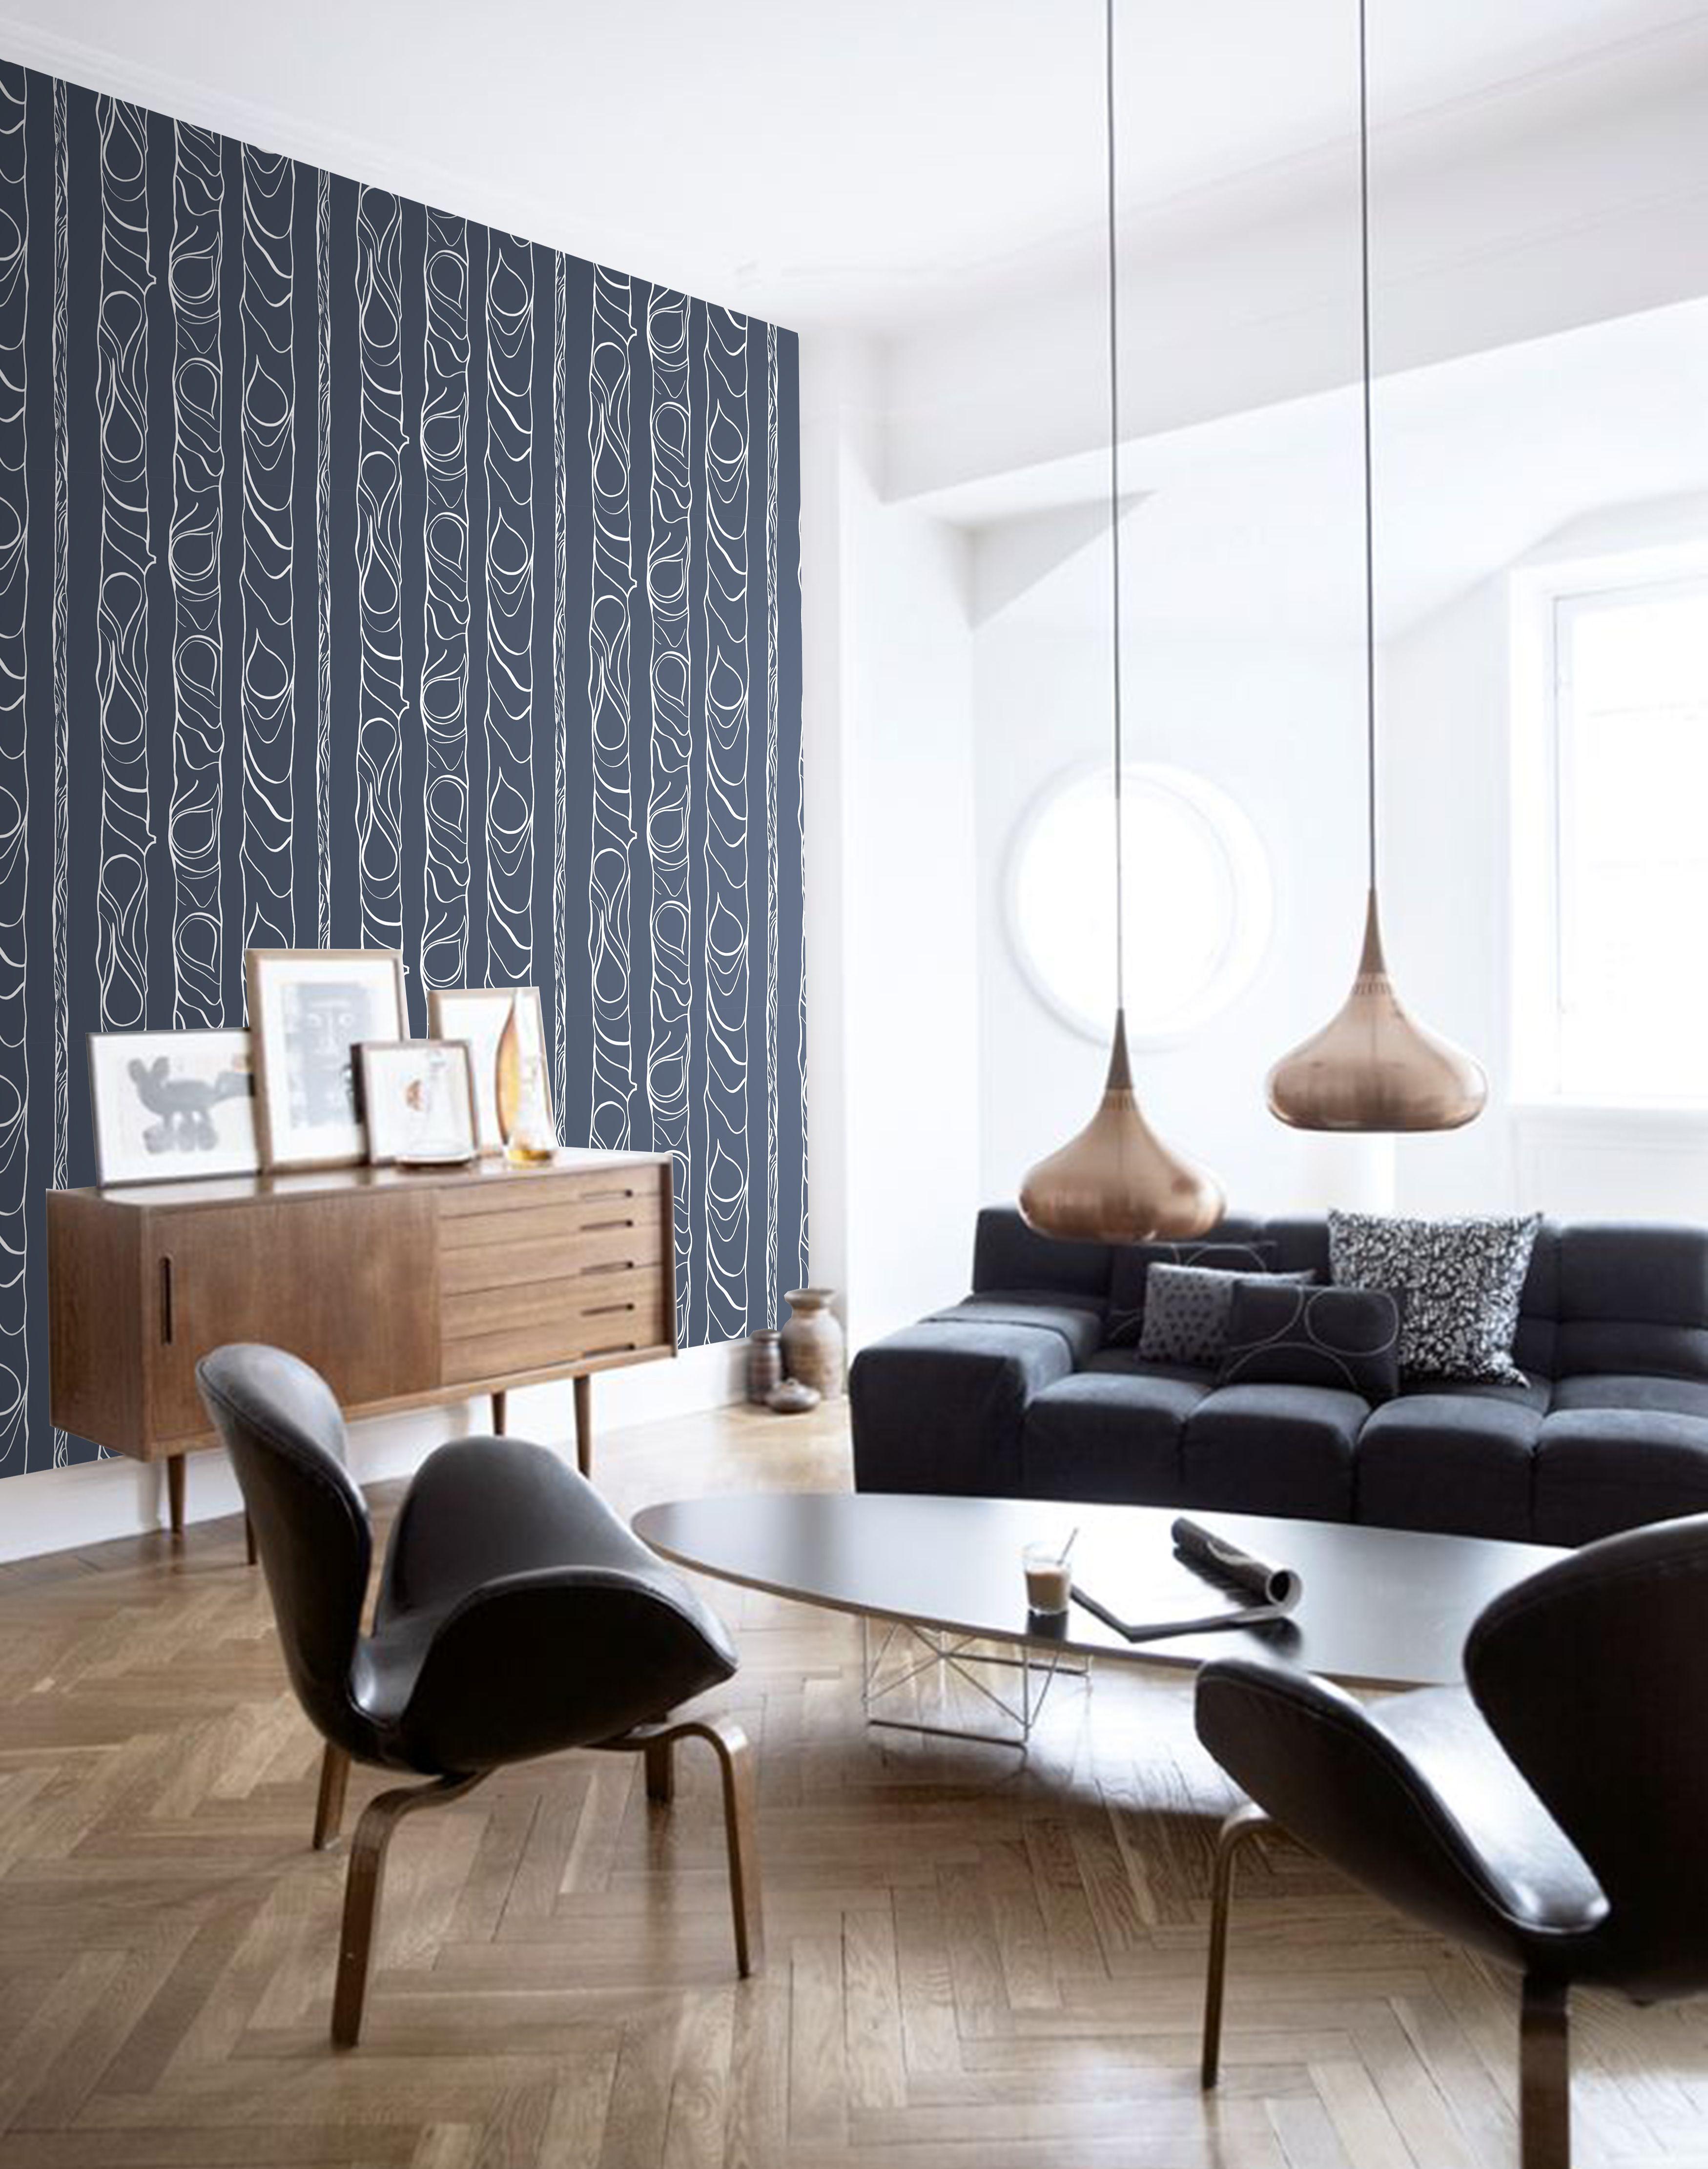 Tree Design Wallpaper Living Room: ZHIVAGO Wallpaper / Blue And White Tree Design